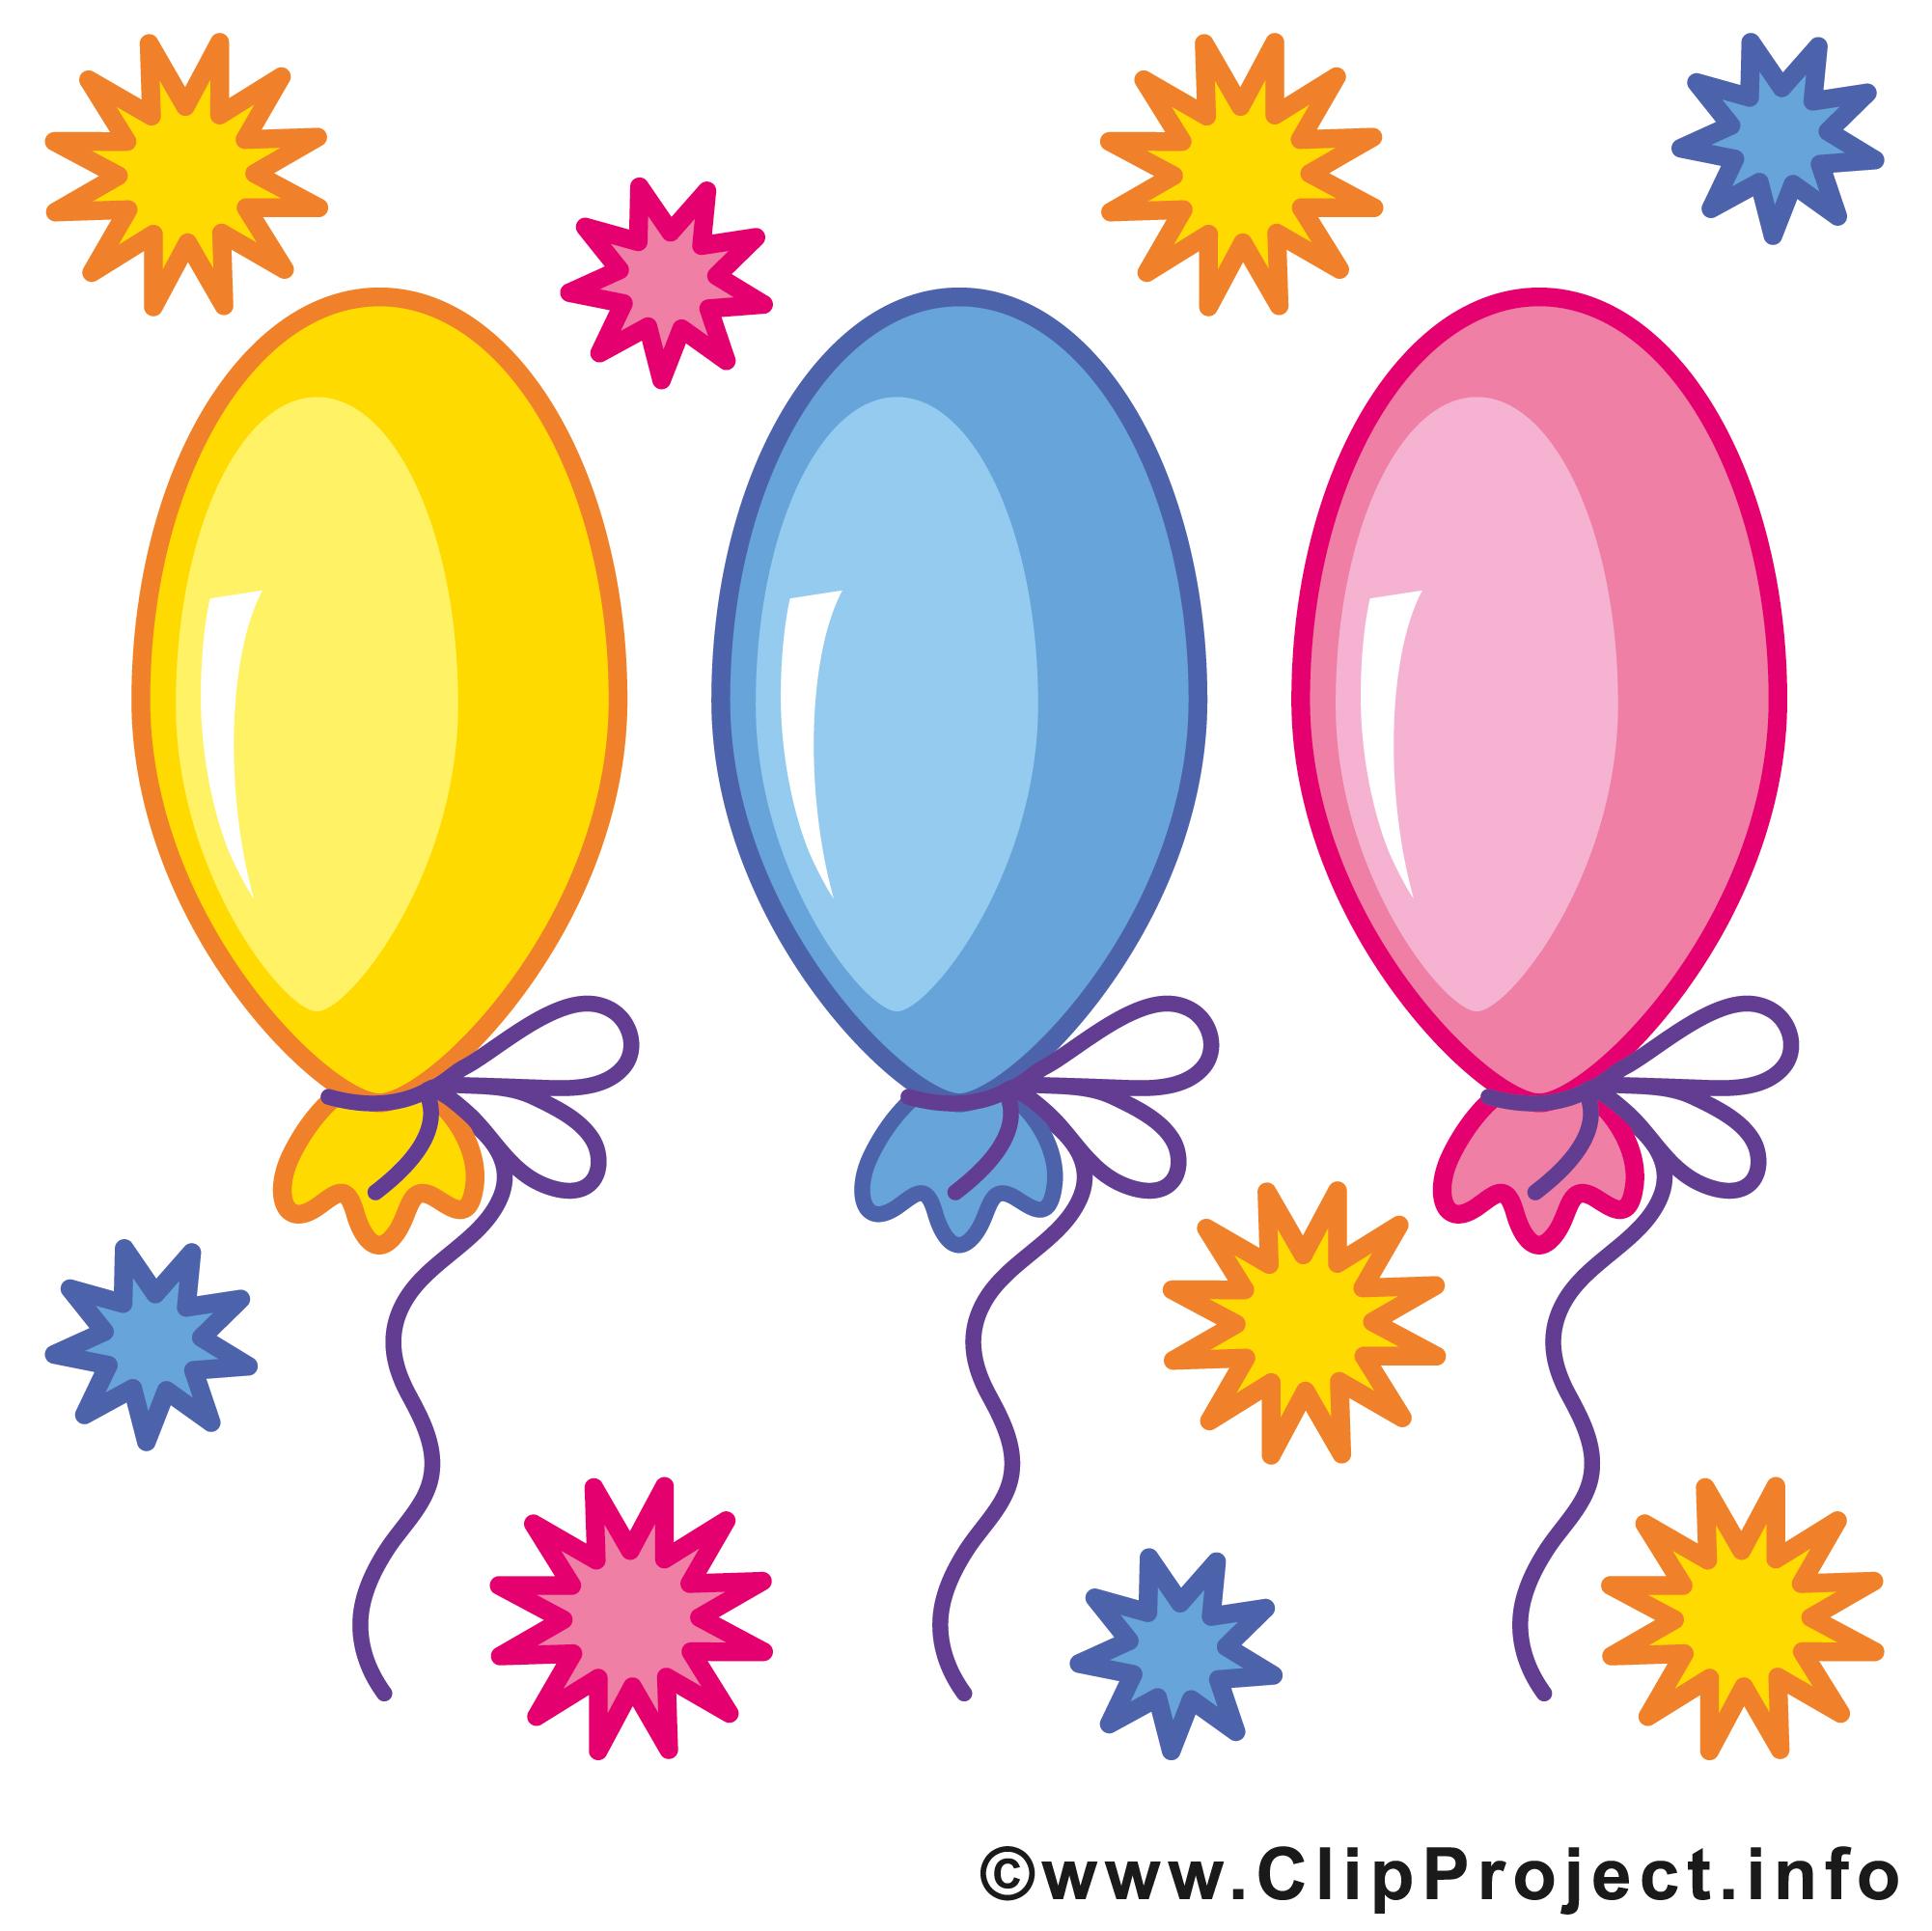 Clipart kostenlos image freeuse Happy birthday clipart kostenlos - ClipartFest image freeuse